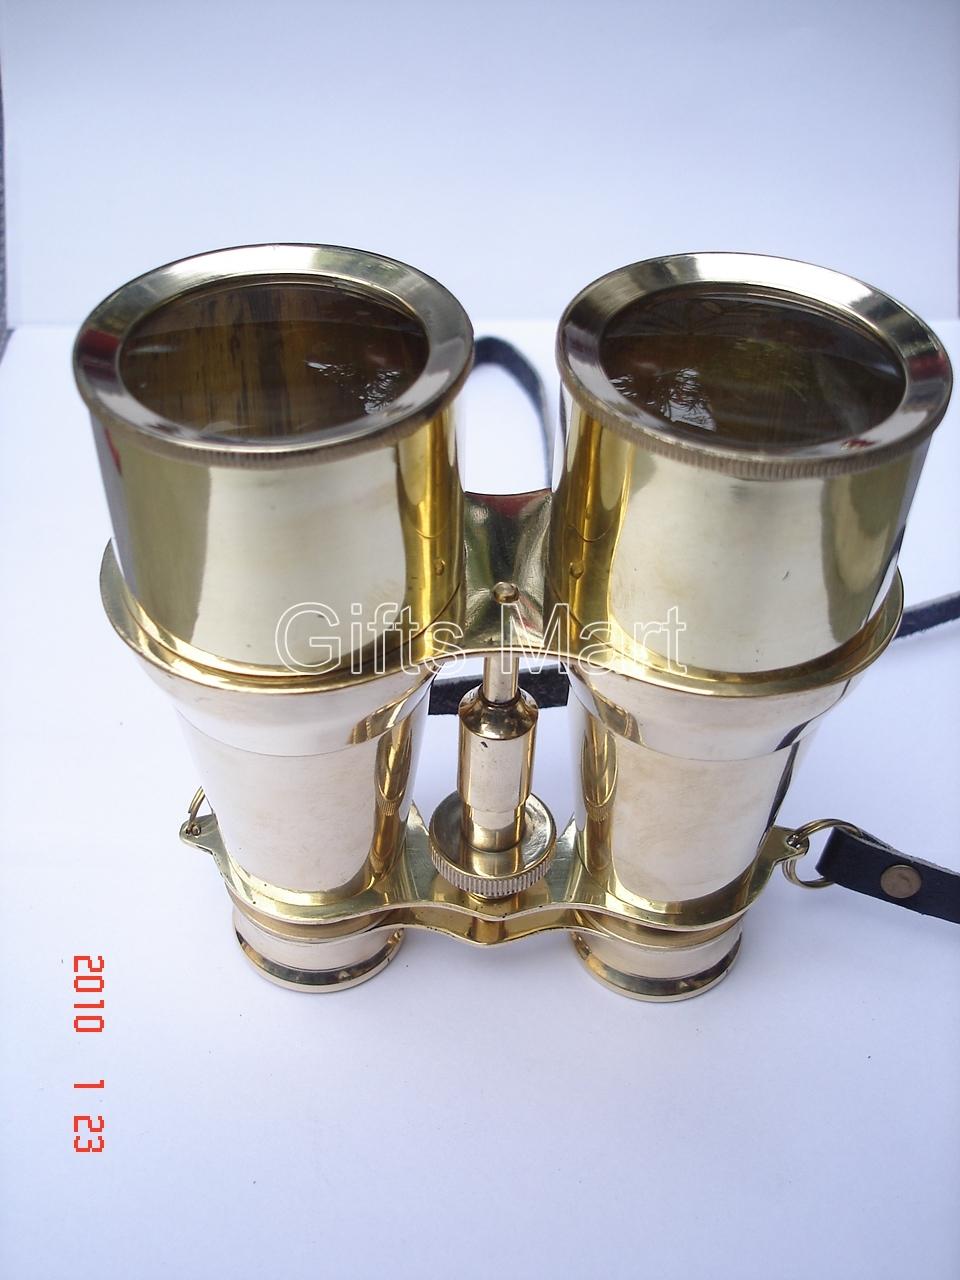 "Solid Brass Binoculars 6"" Nautical Survey, offce home decor display fancy gift i"